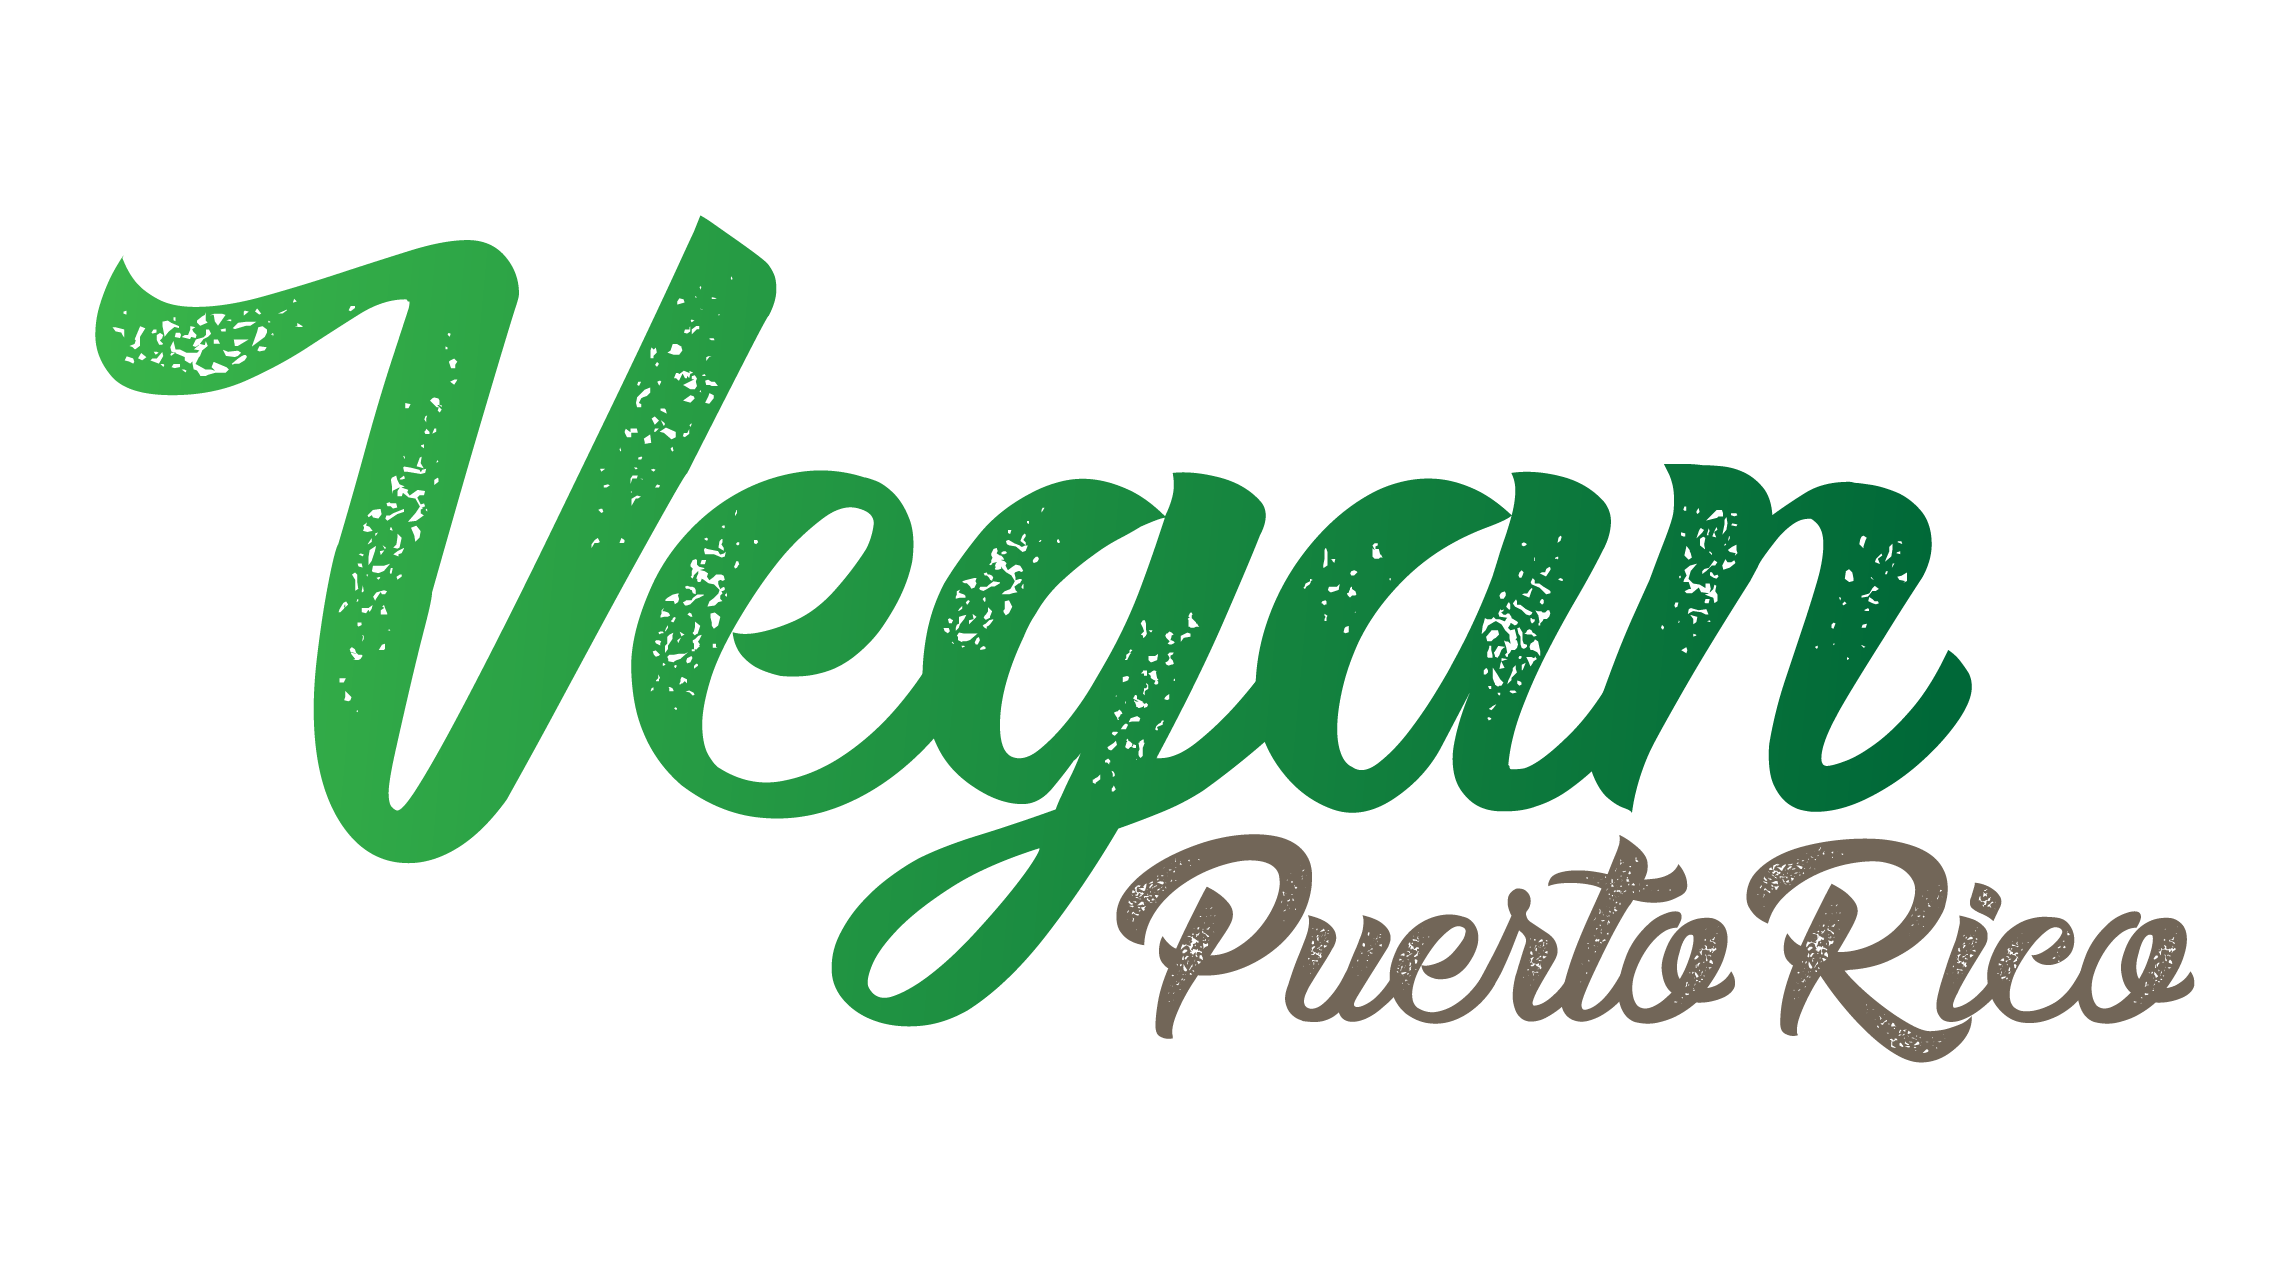 Vegan Puerto Rico